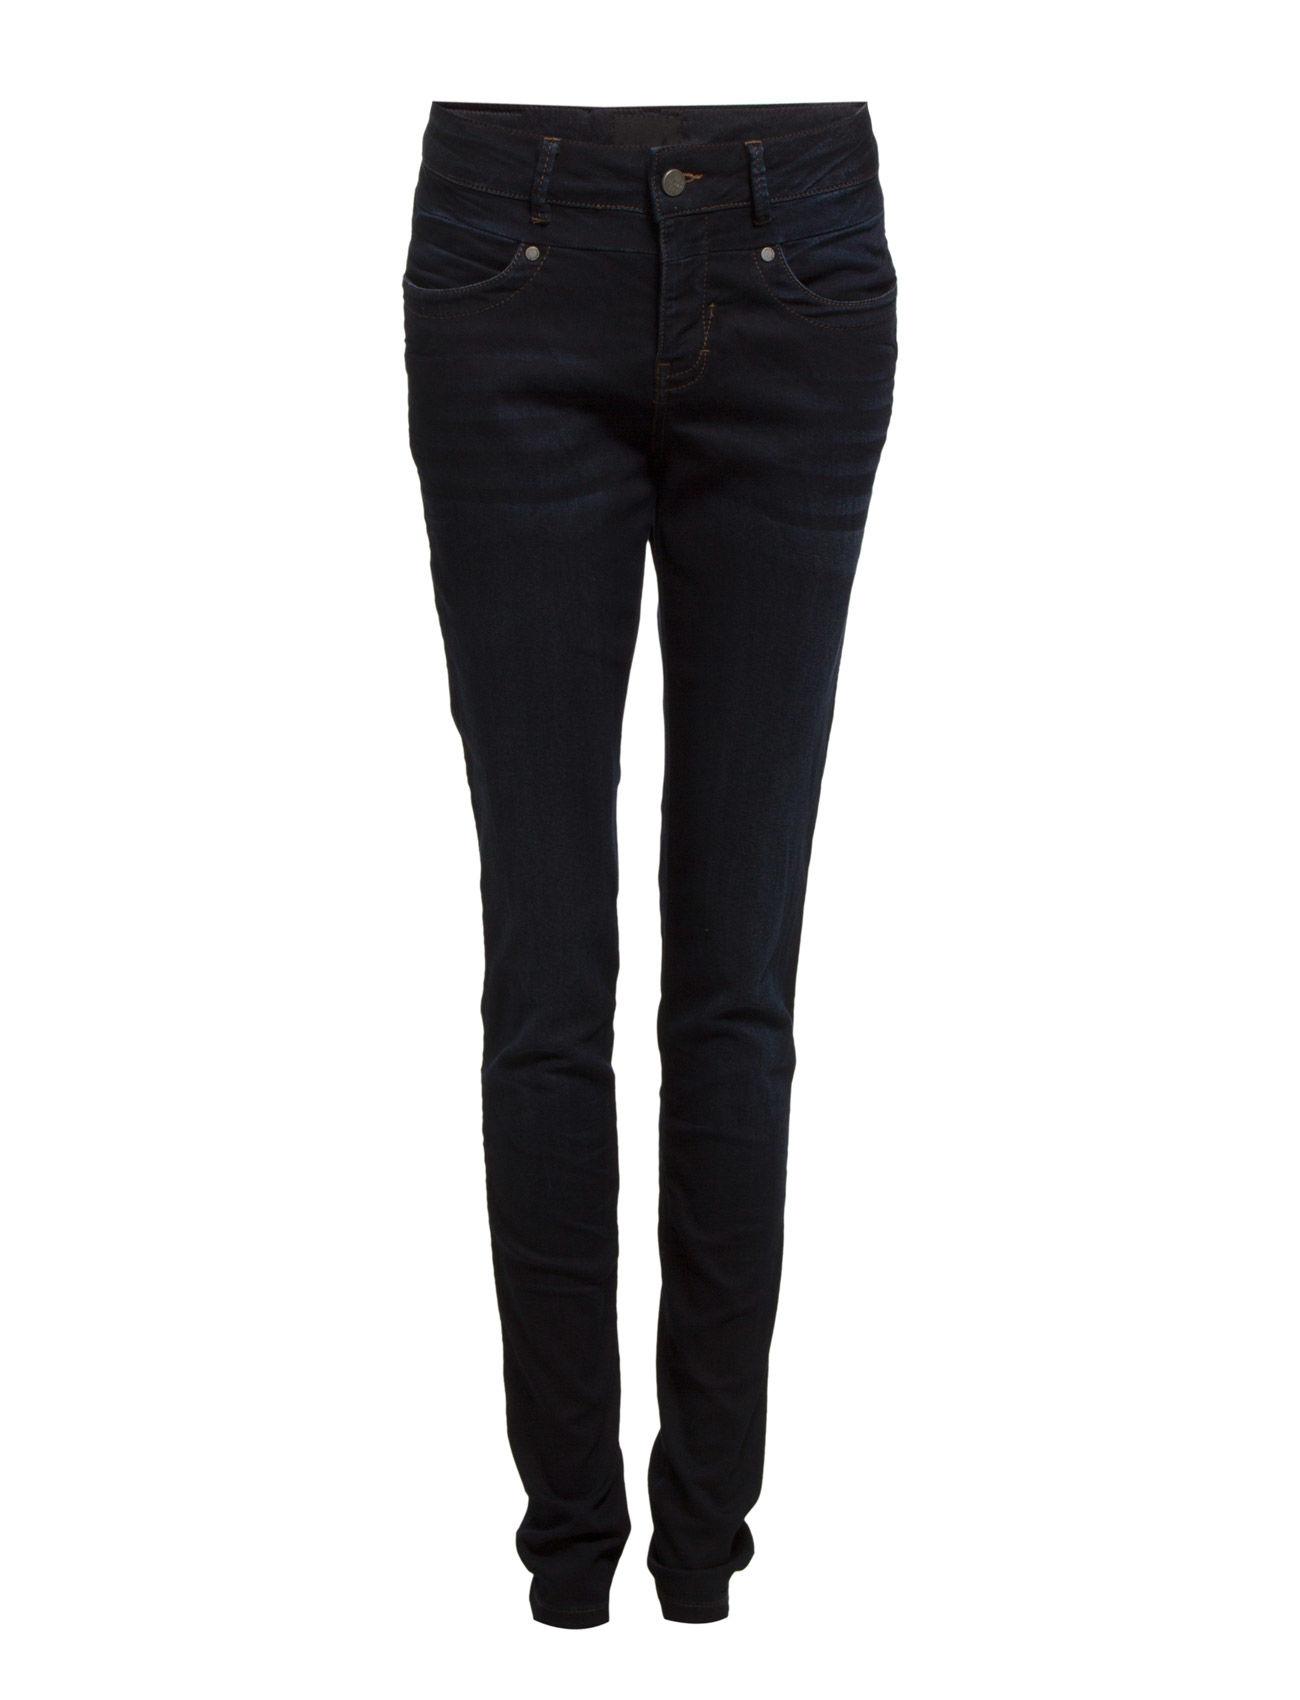 Ursula 3 Jeans/Tessa Fit Dranella Skinny